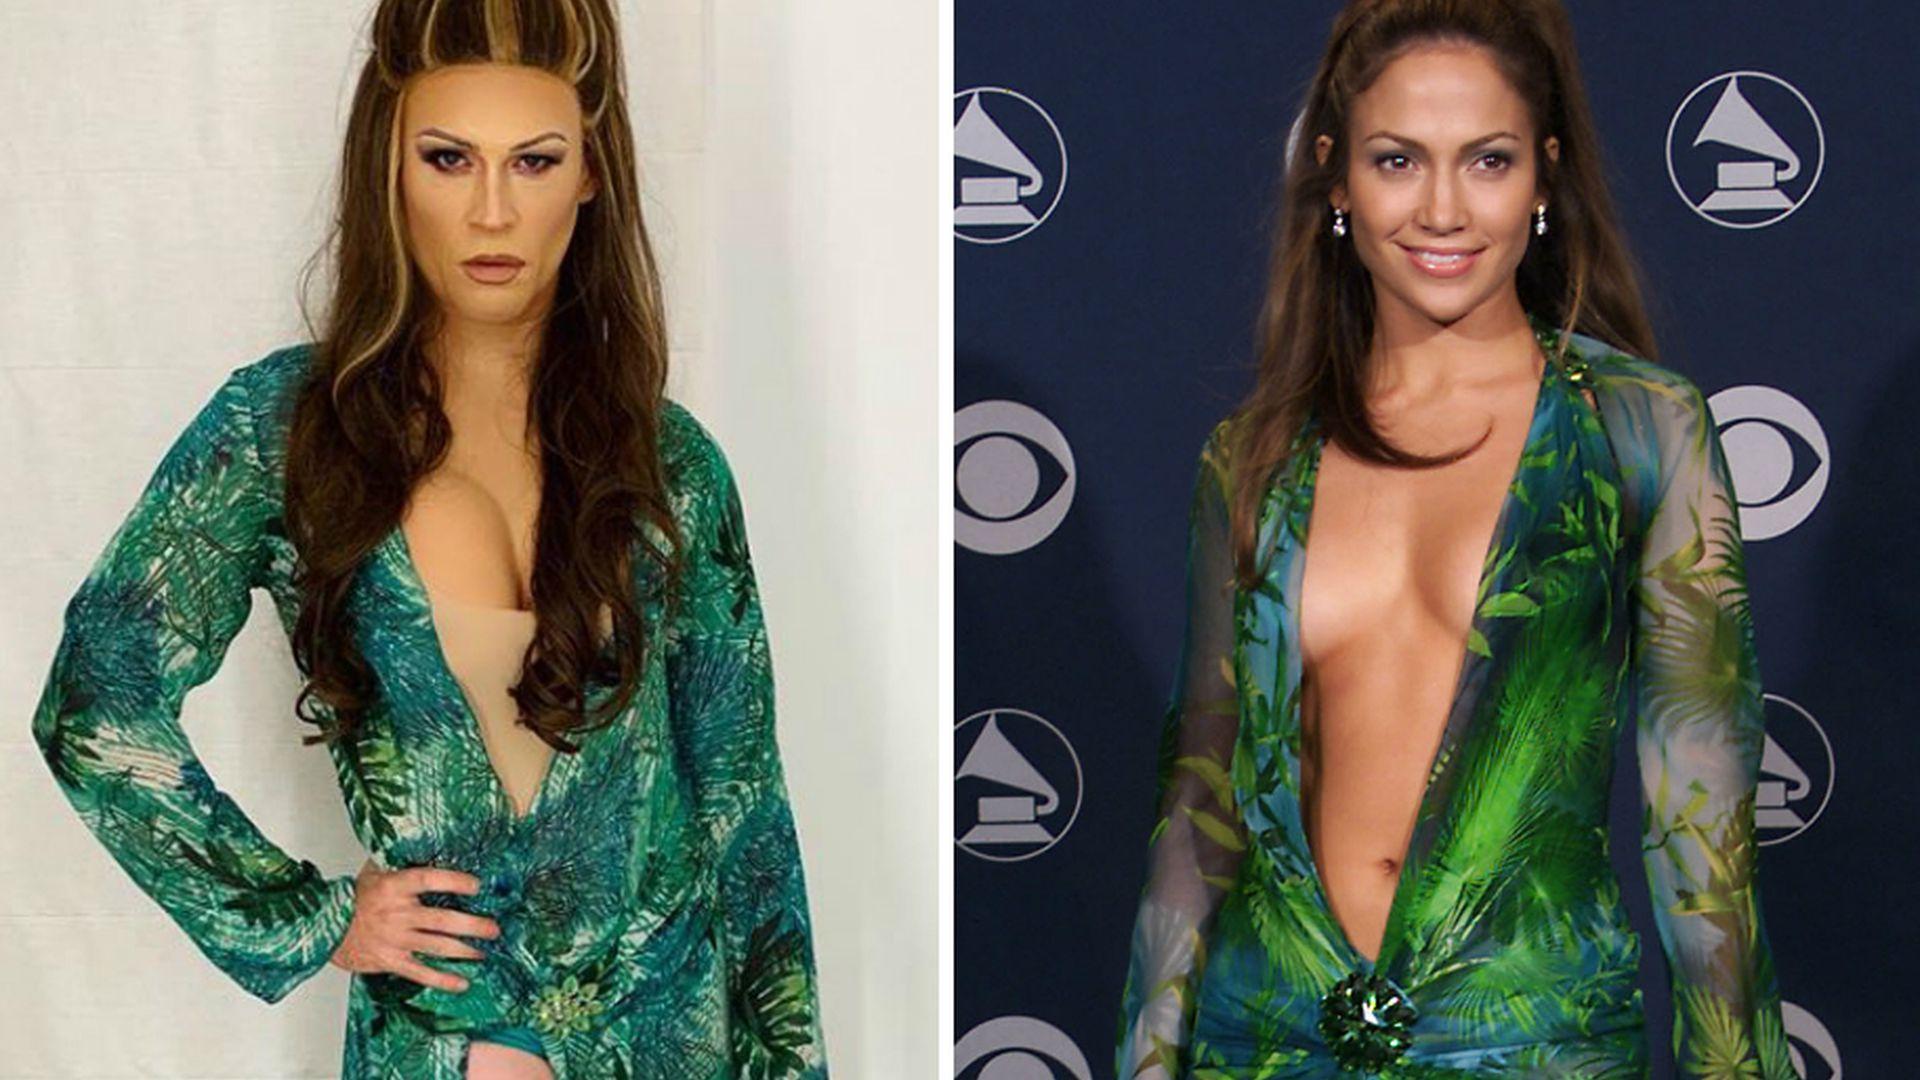 So ähnlich! TV-Host imitiert Jennifer Lopez' Versace-Look! - Promiflash.de